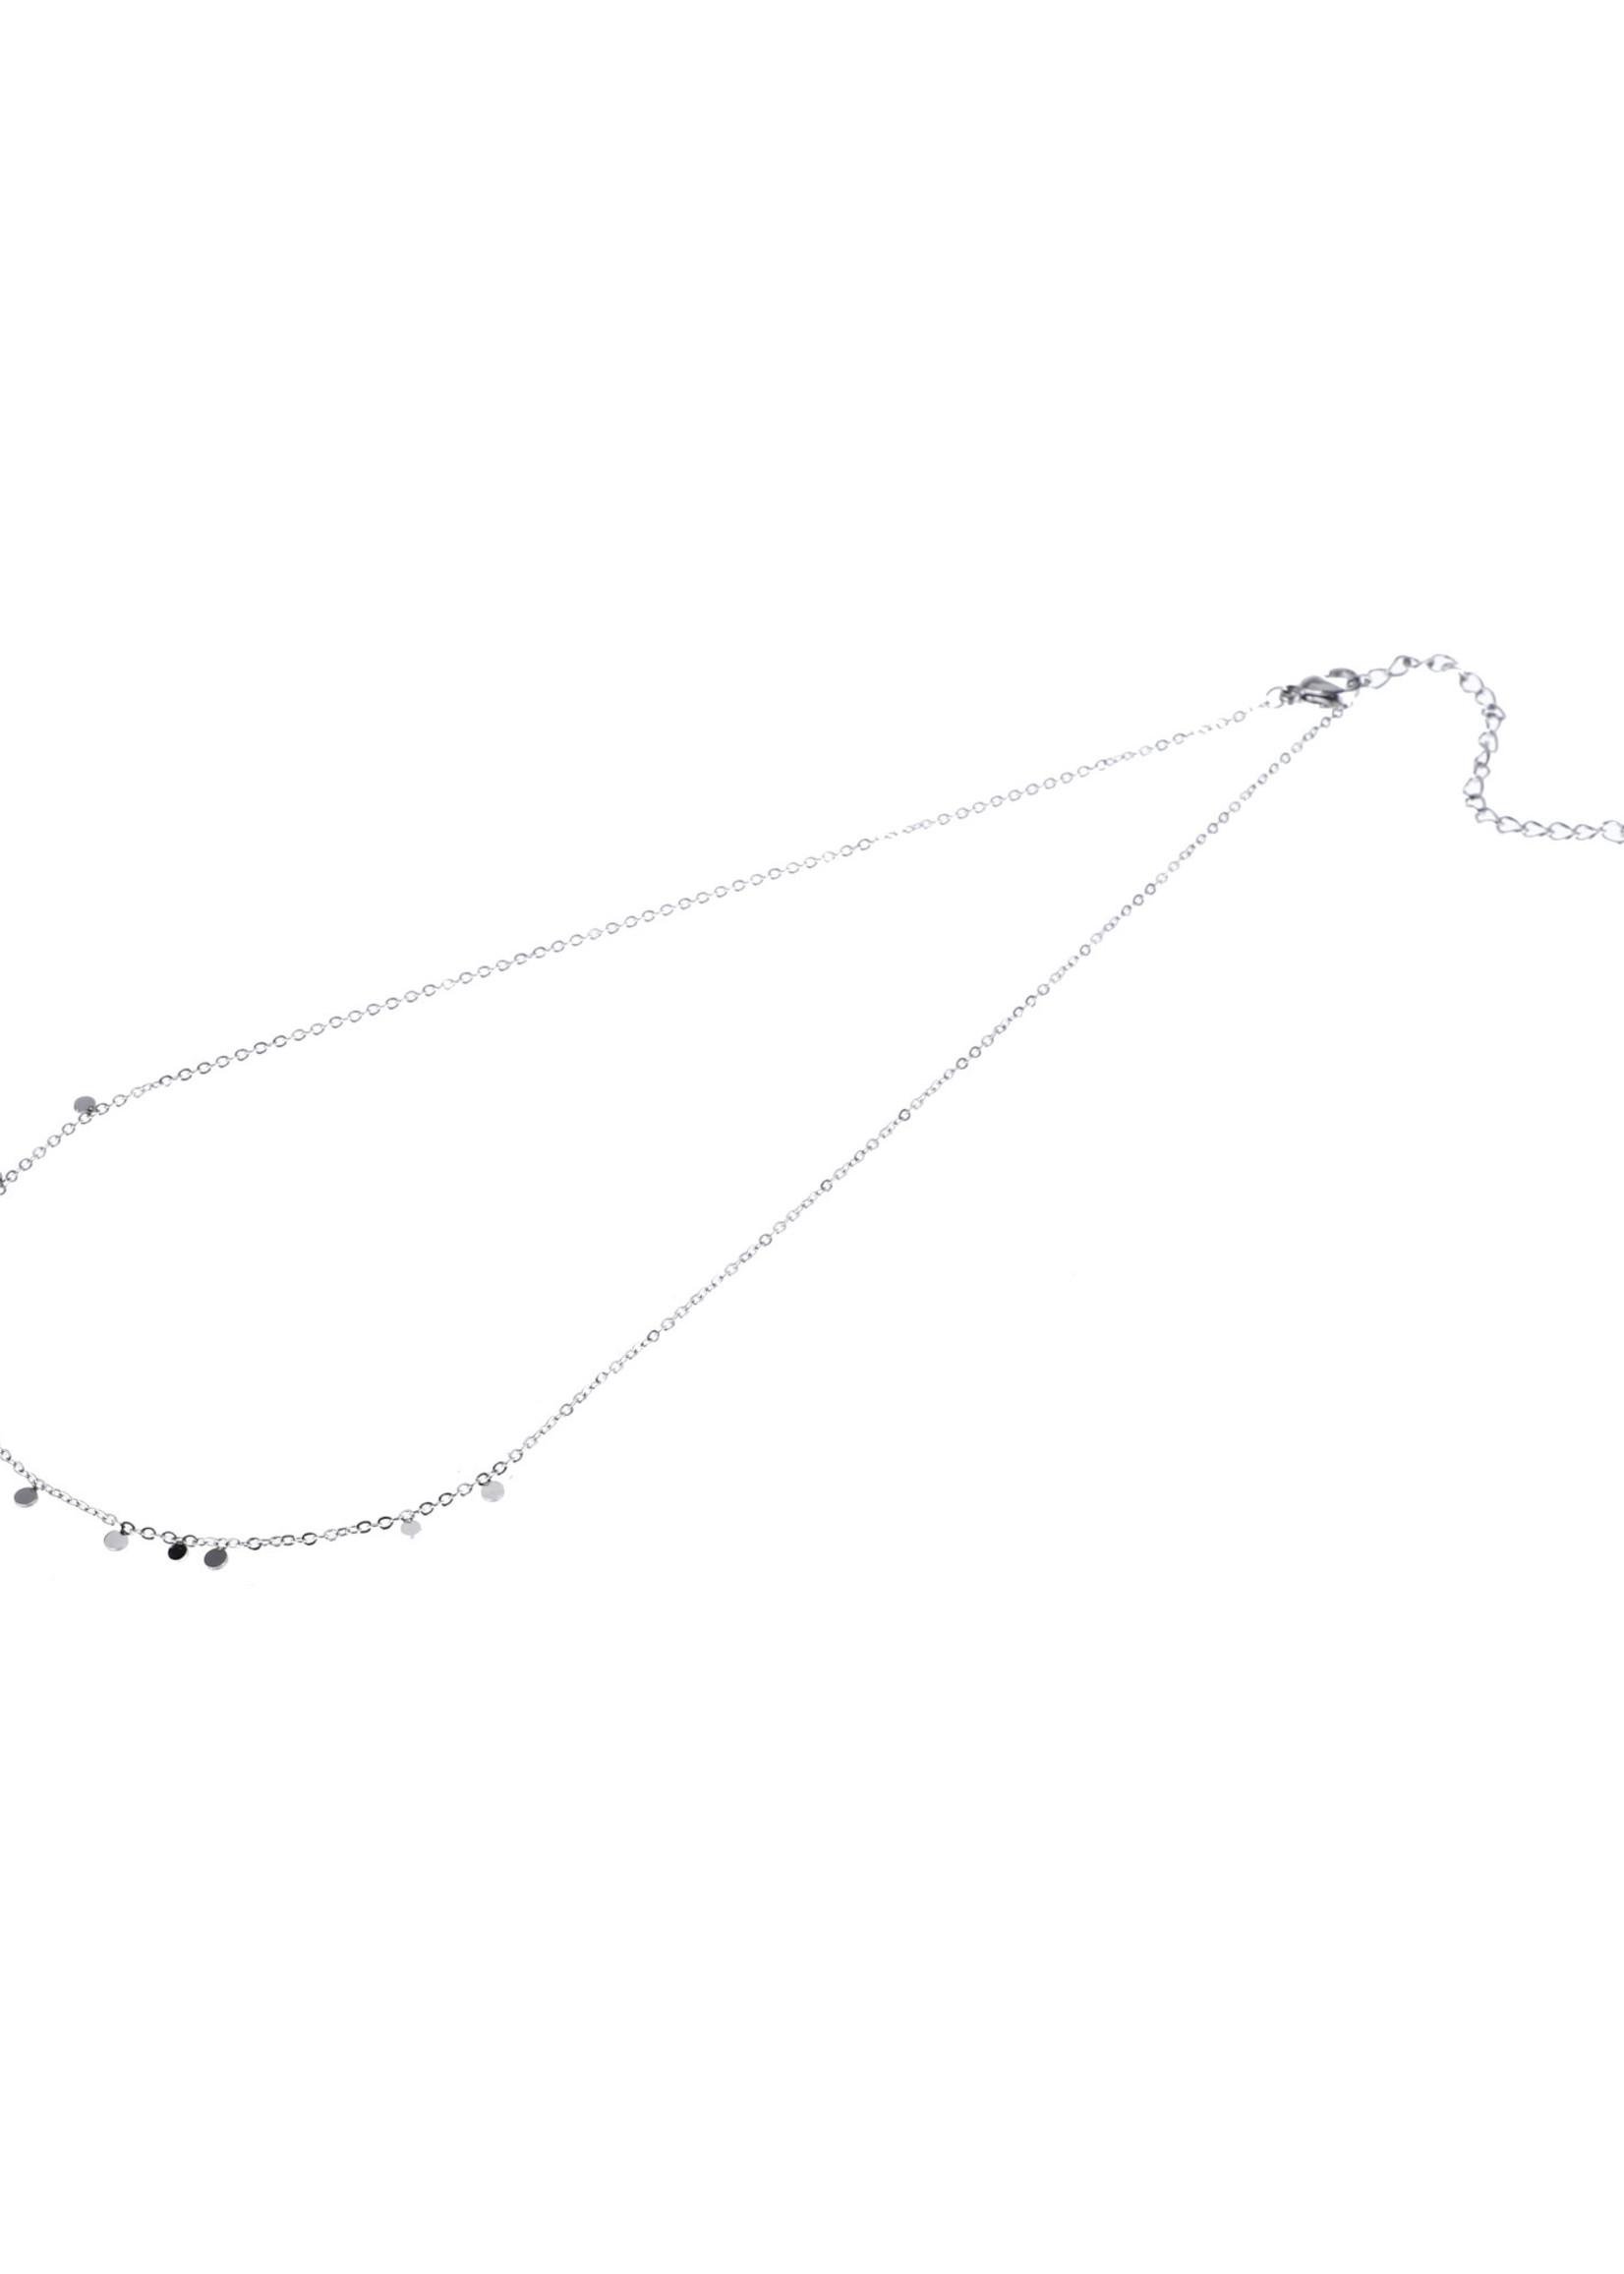 Ketting zilver kleine rondjes N9869-1